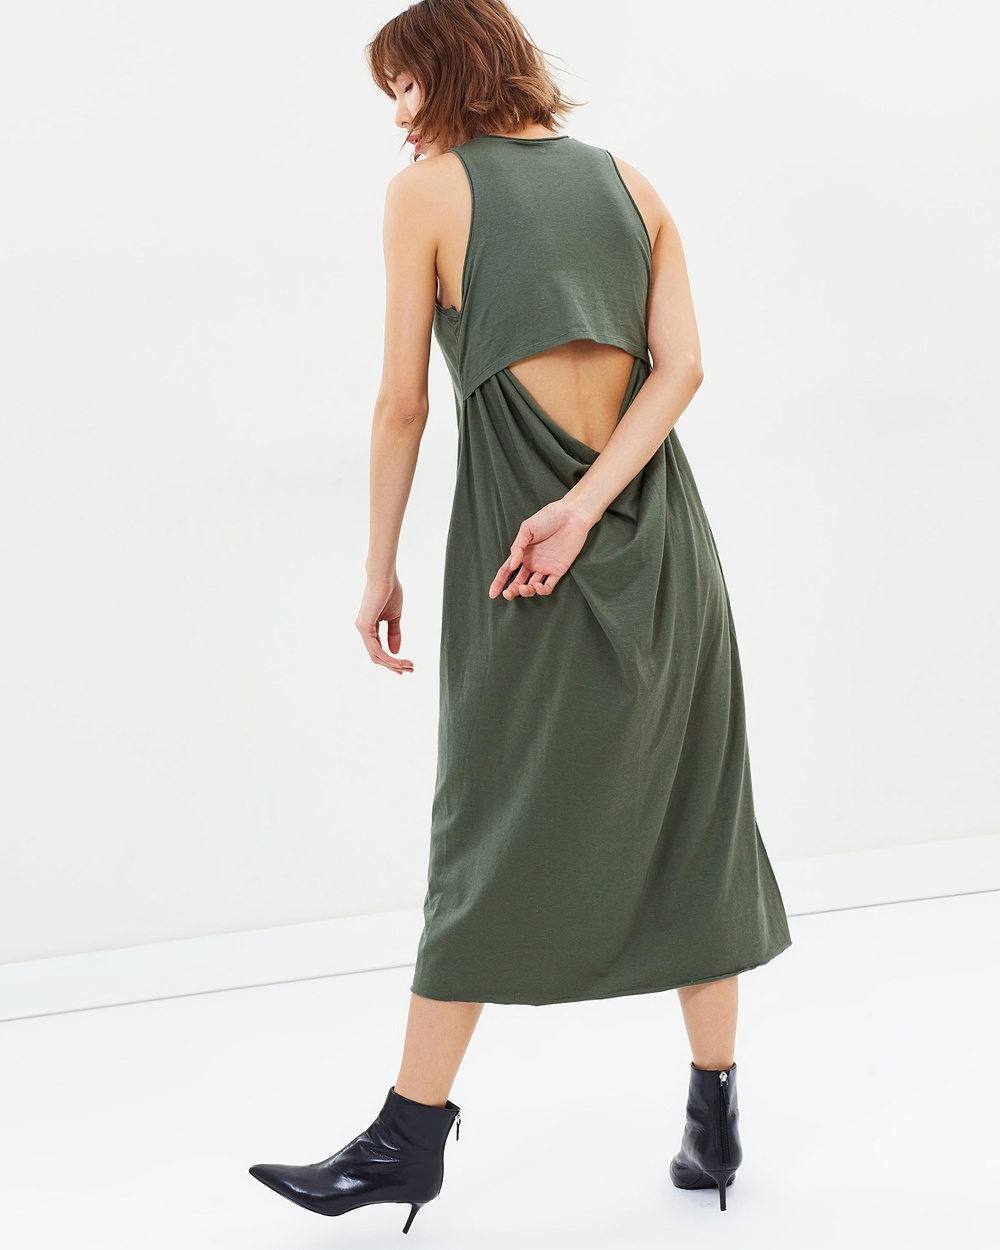 KITX Hemp Lover Dress Dresses Khaki Hemp Lover Dress